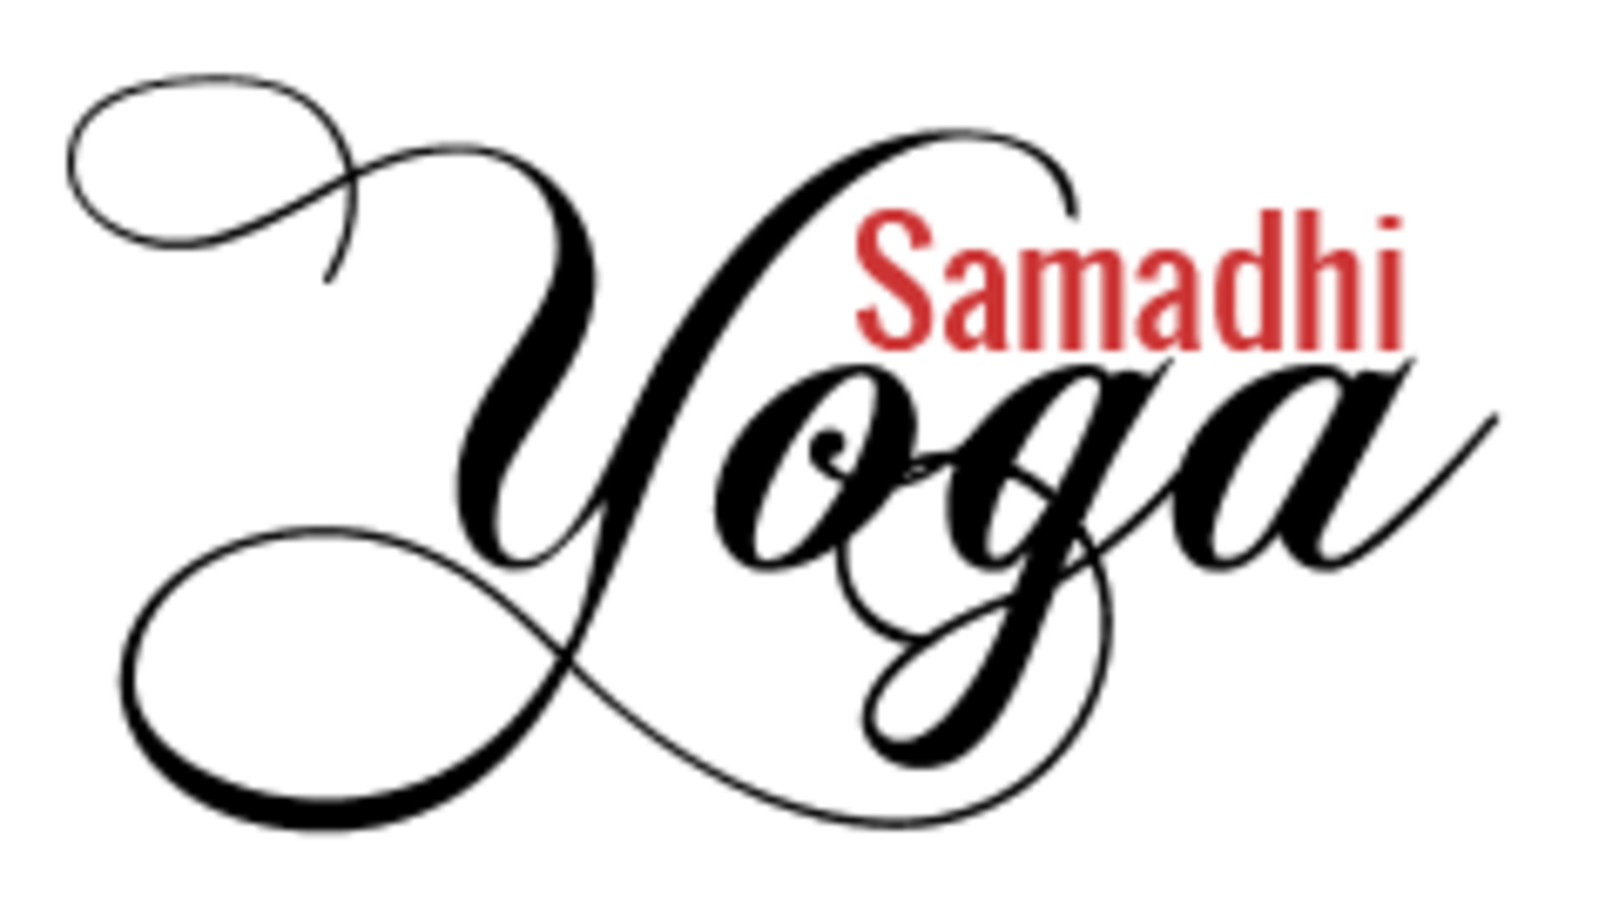 Yoga - Yoga Samadhi